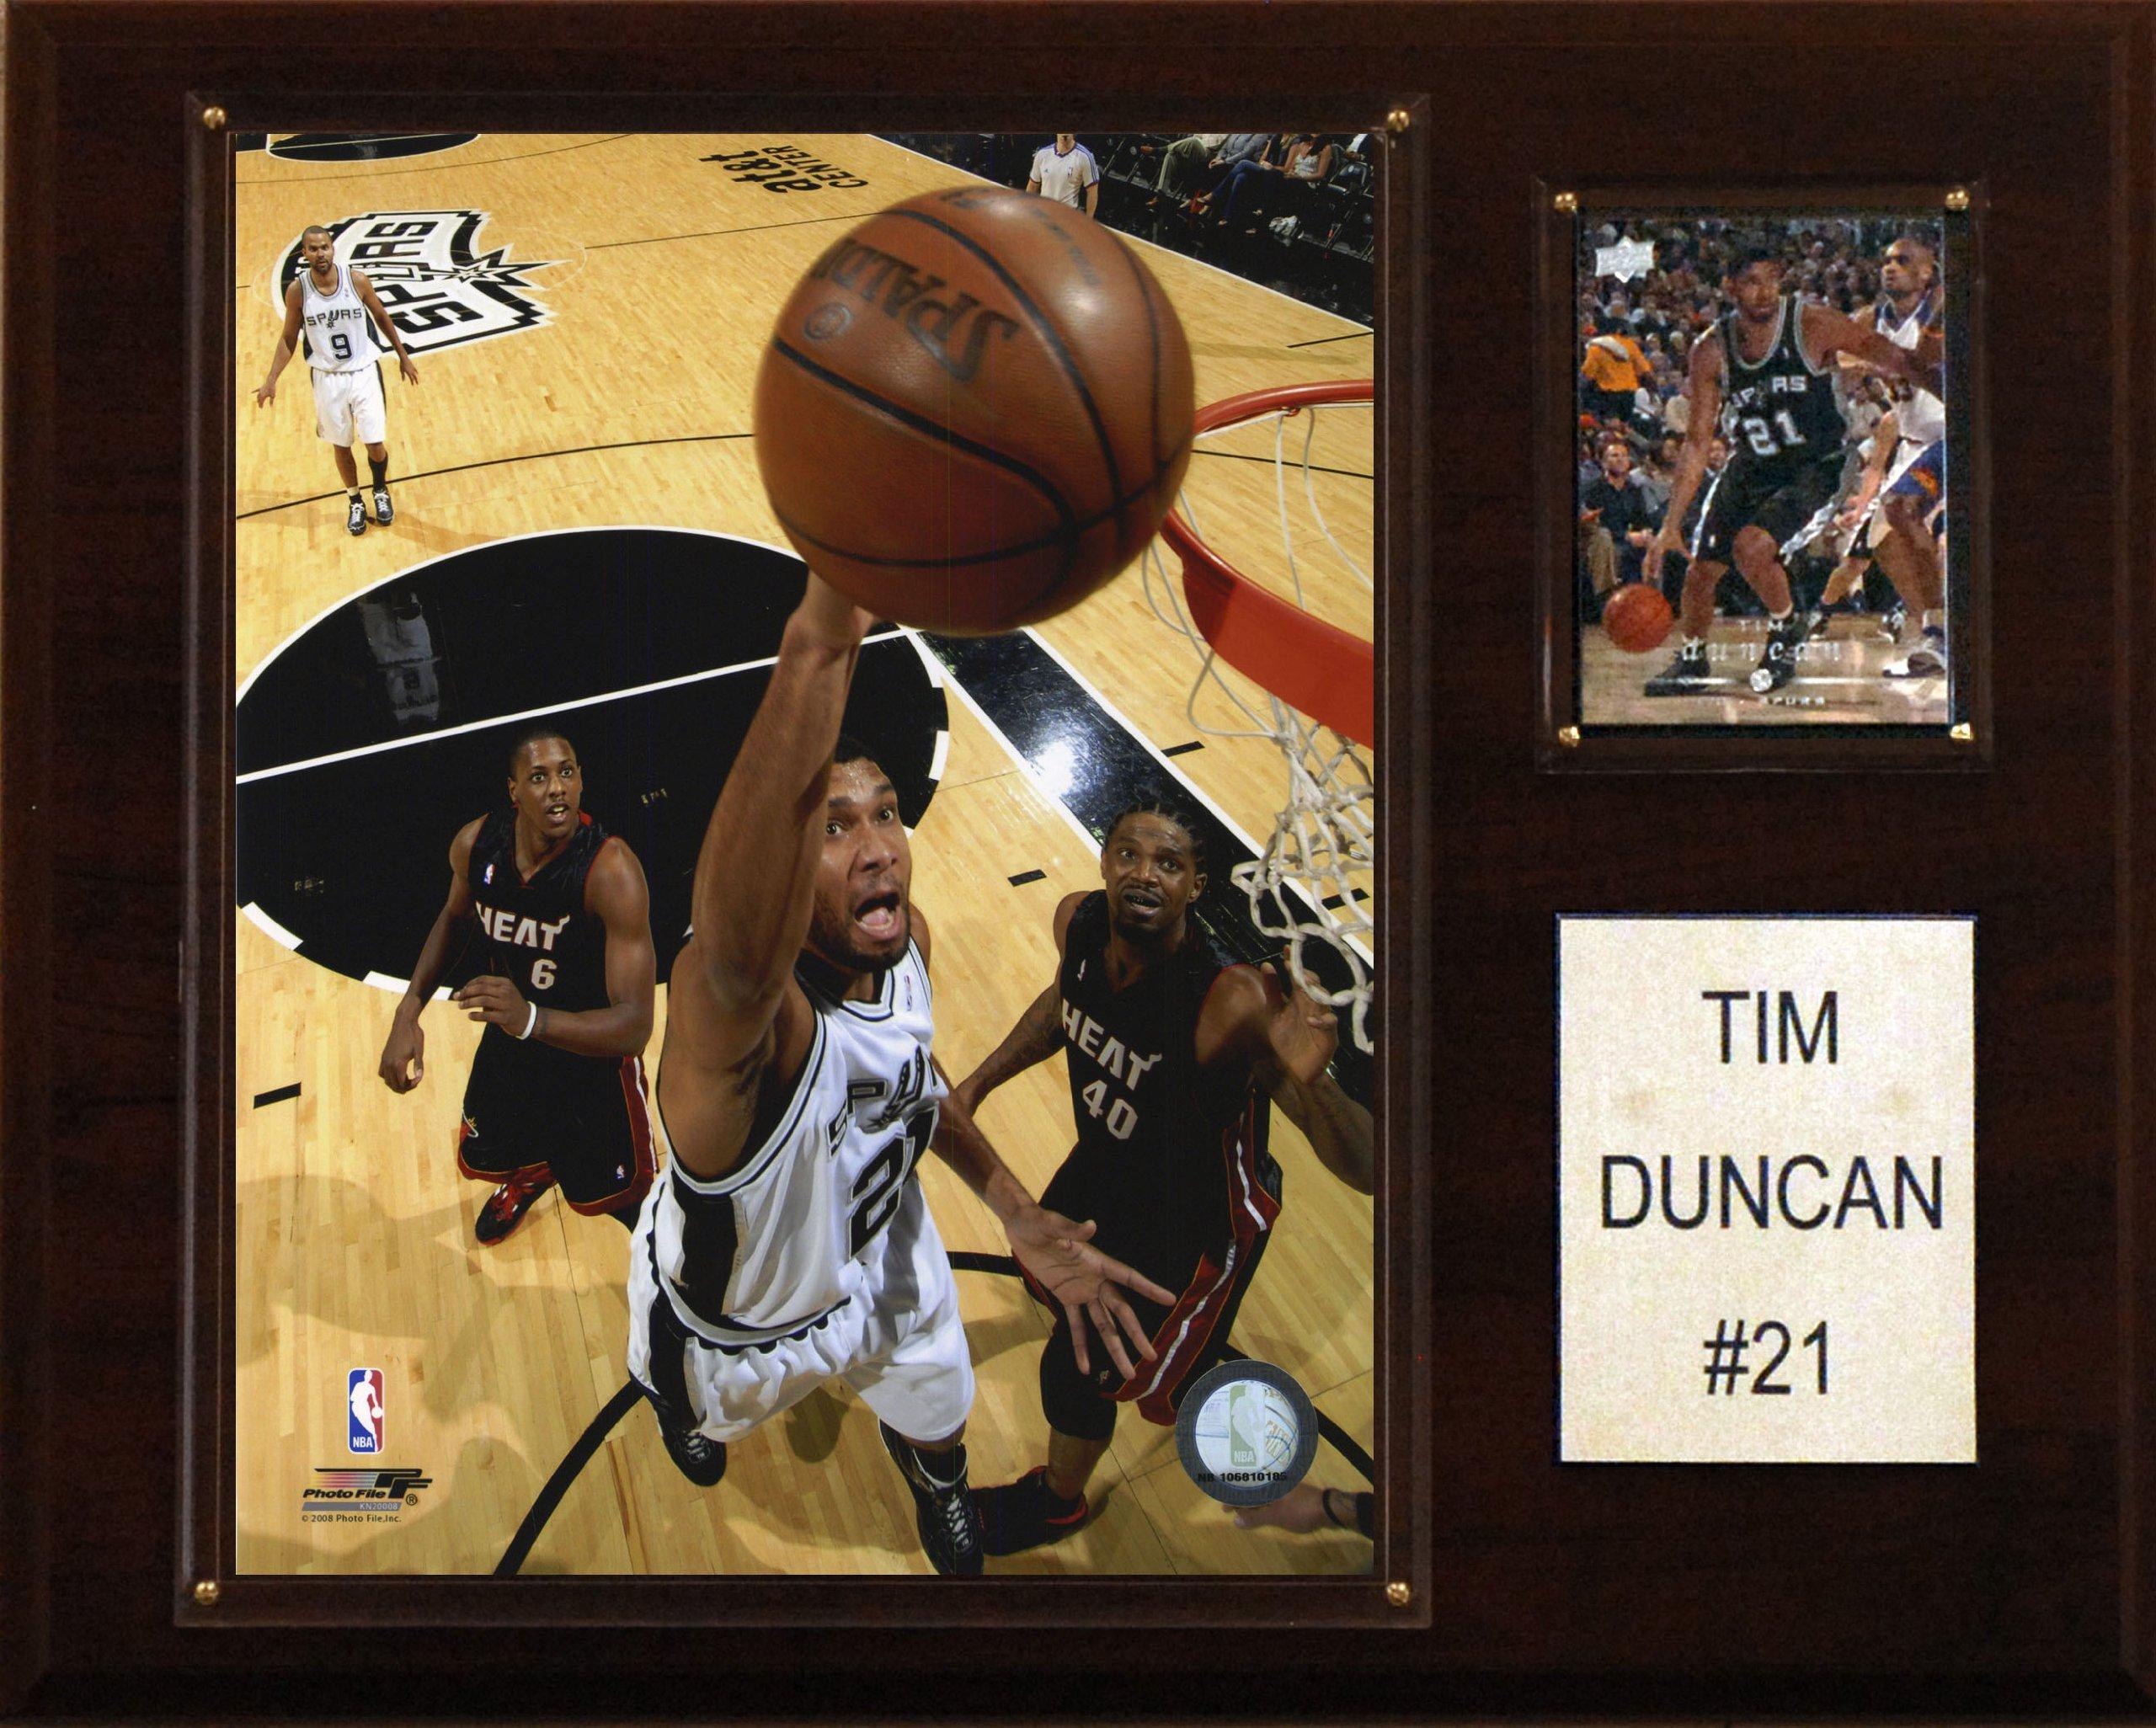 NBA Tim Duncan San Antonio Spurs Player Plaque by C&I Collectables